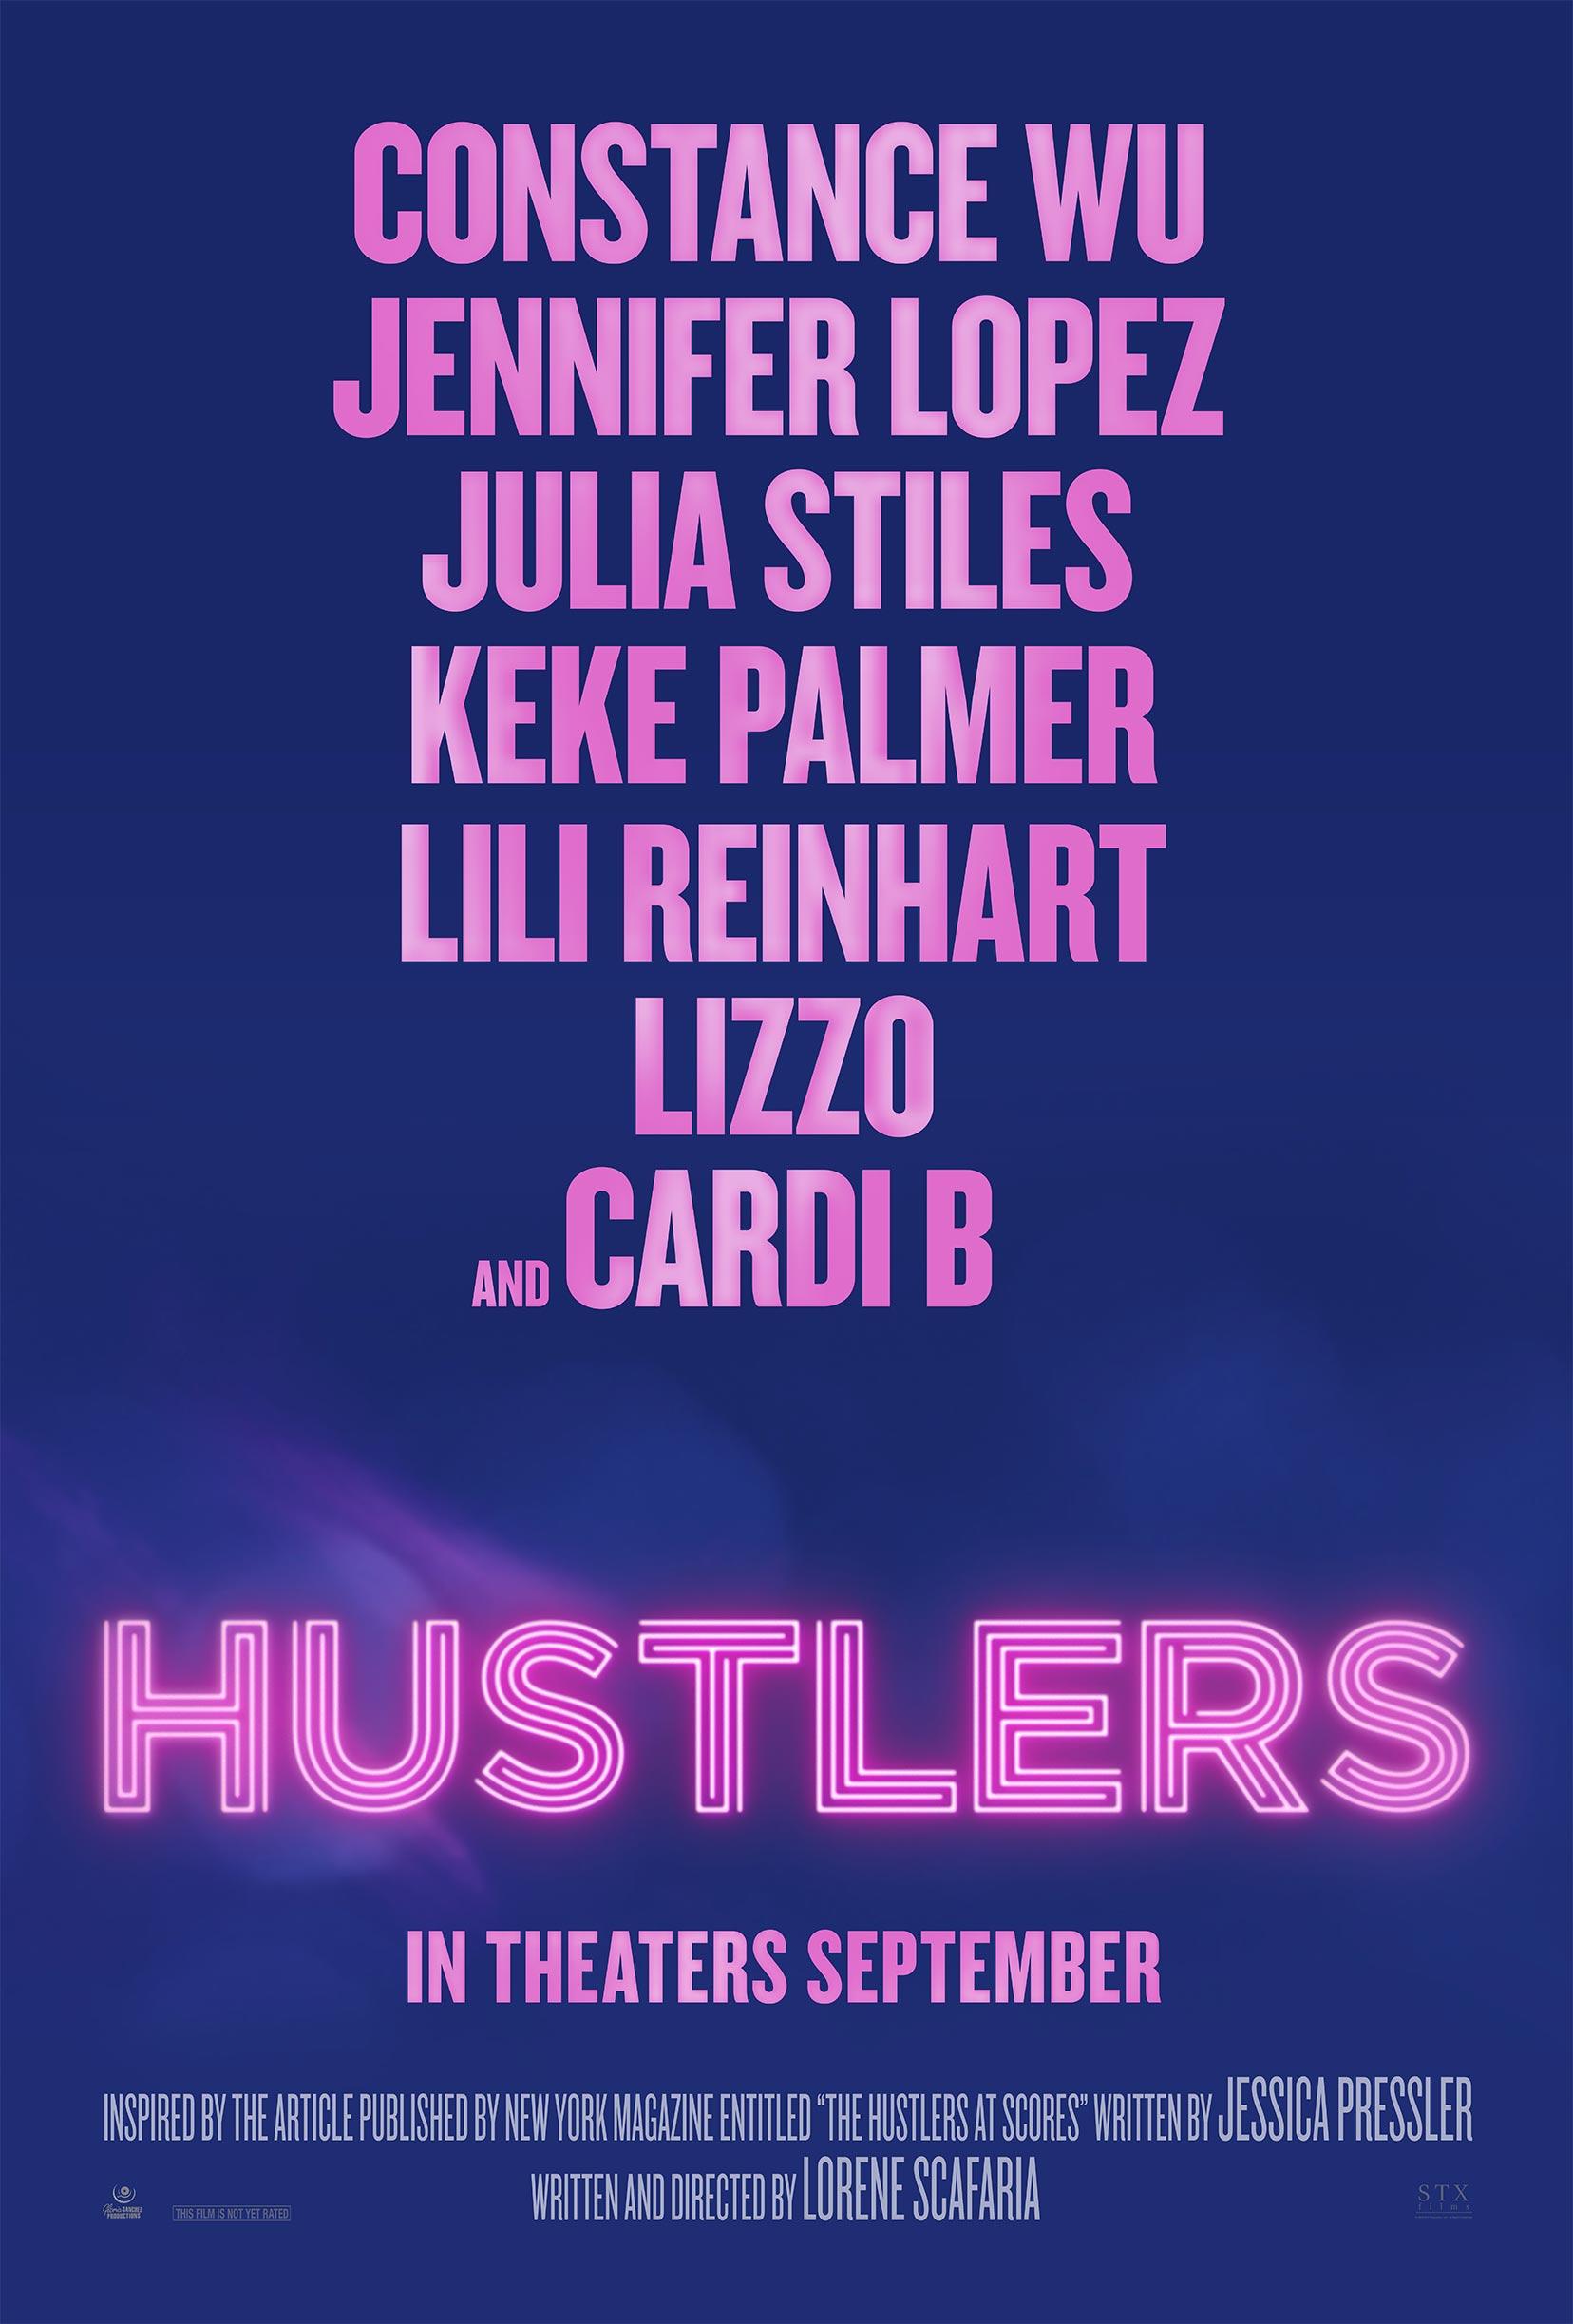 Jennifer Lopez Takes Down Wall Street Crooks in New Trailer for 'Hustlers'